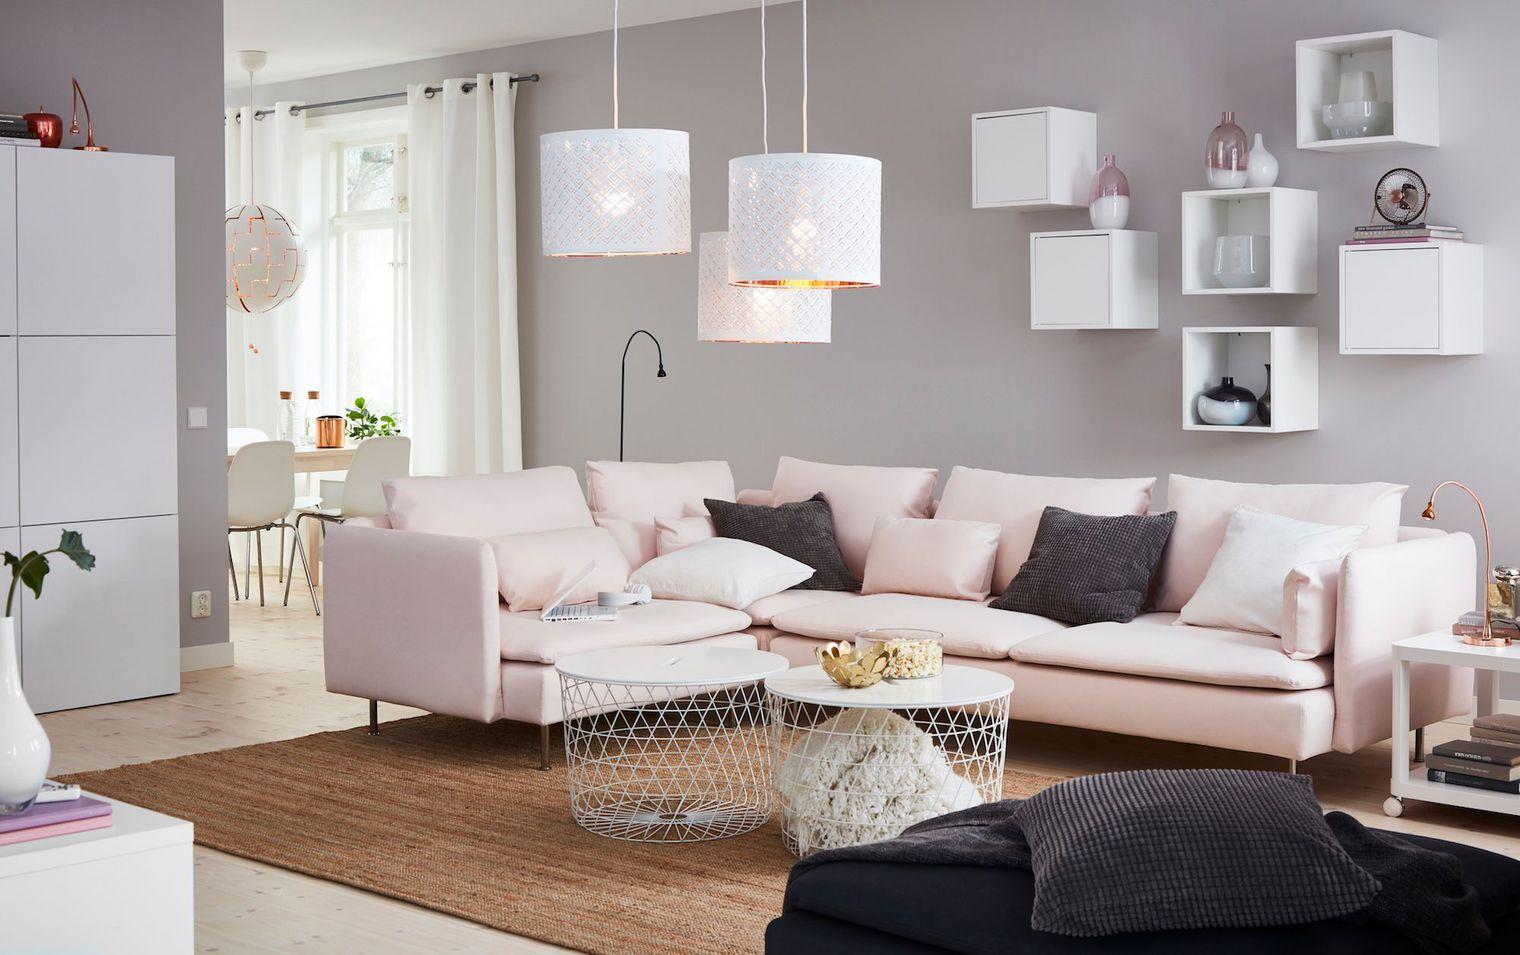 Table de rangement kvistbro coloris blanc h 61 cm 49 euros ikea ambiance en 2018 - Table salon blanc ikea ...